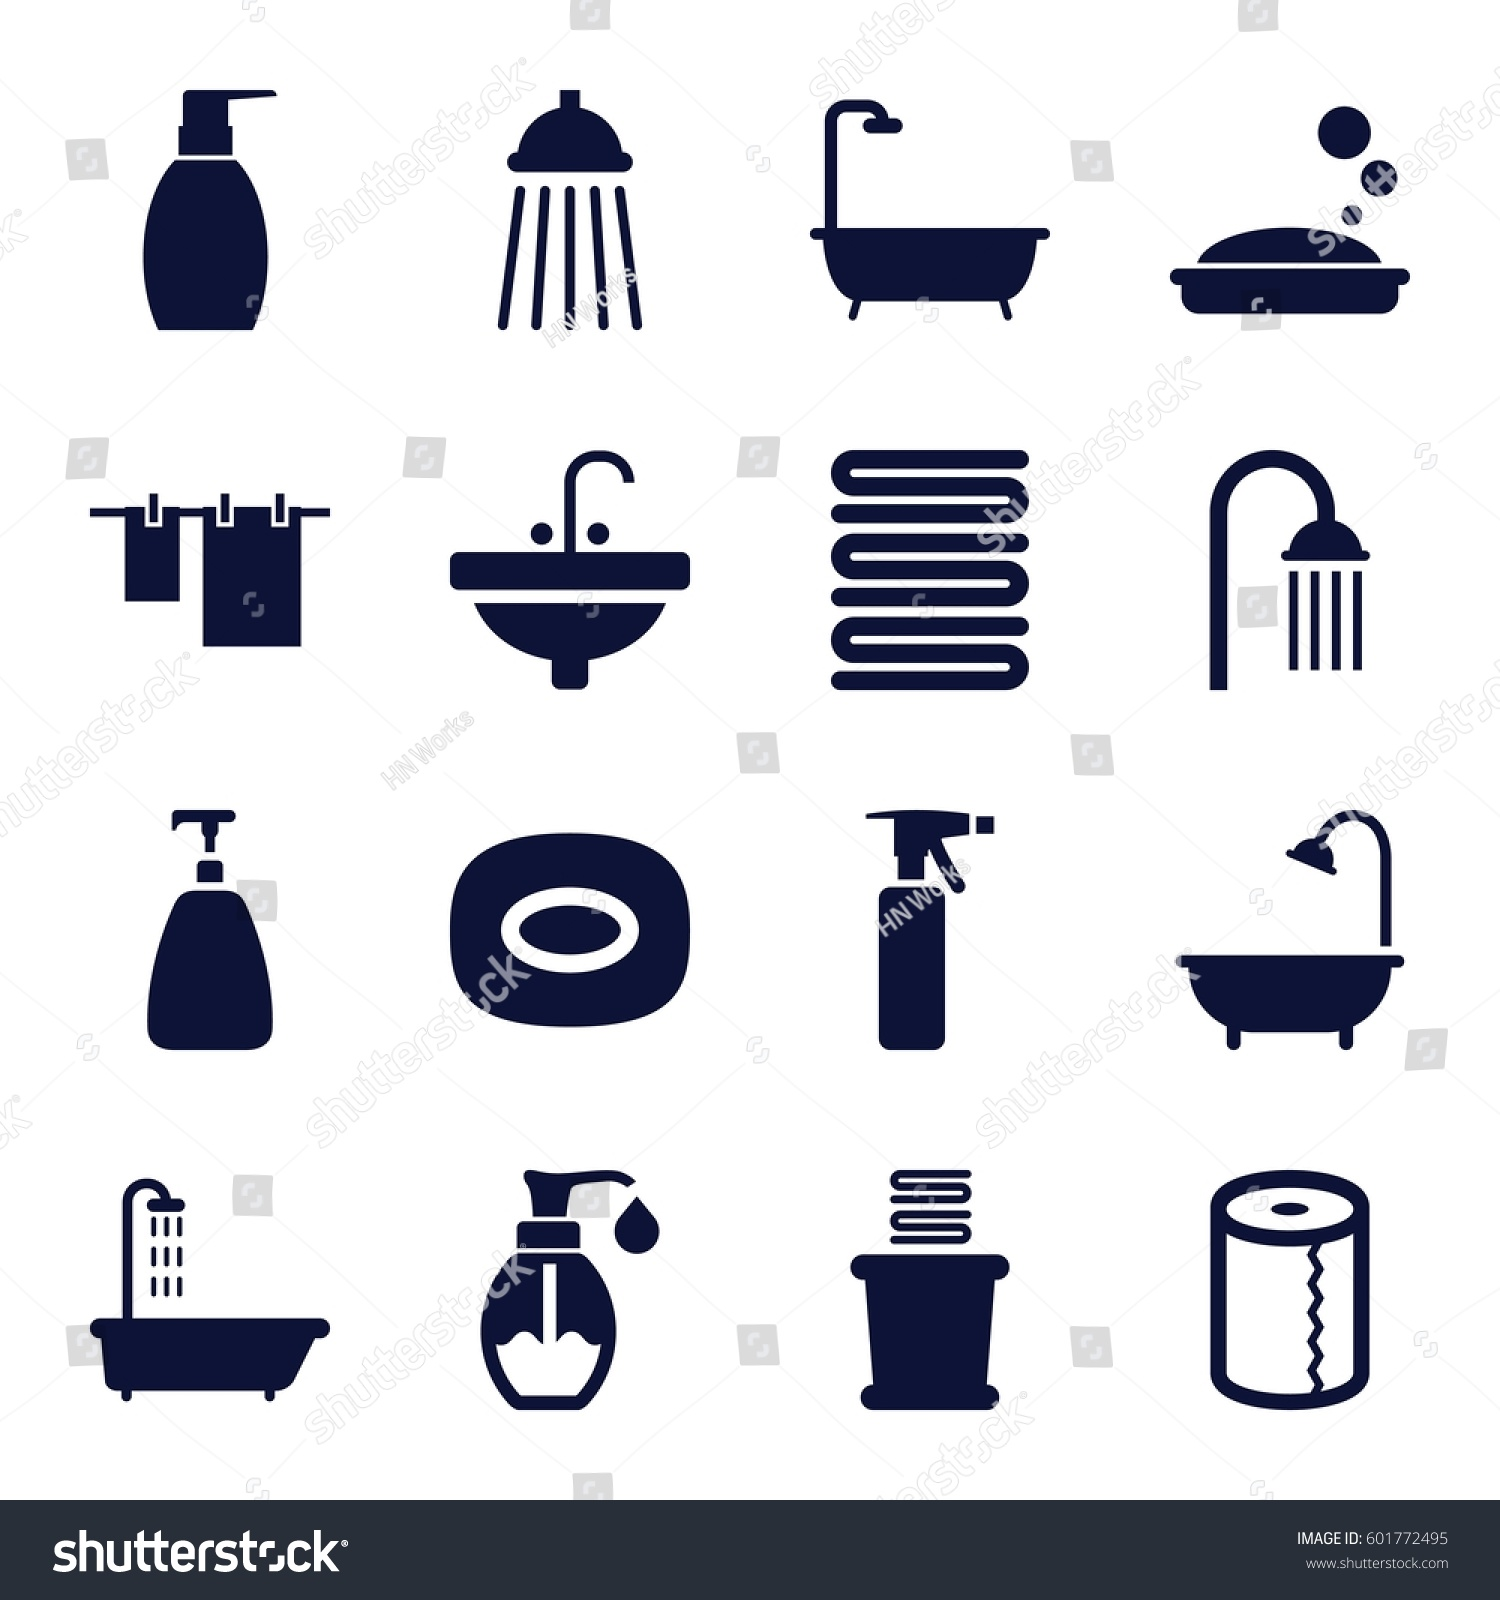 bath icons set set 16 bath stock vector 601772495 shutterstock bath icons set set of 16 bath filled icons such as shower spray bottle